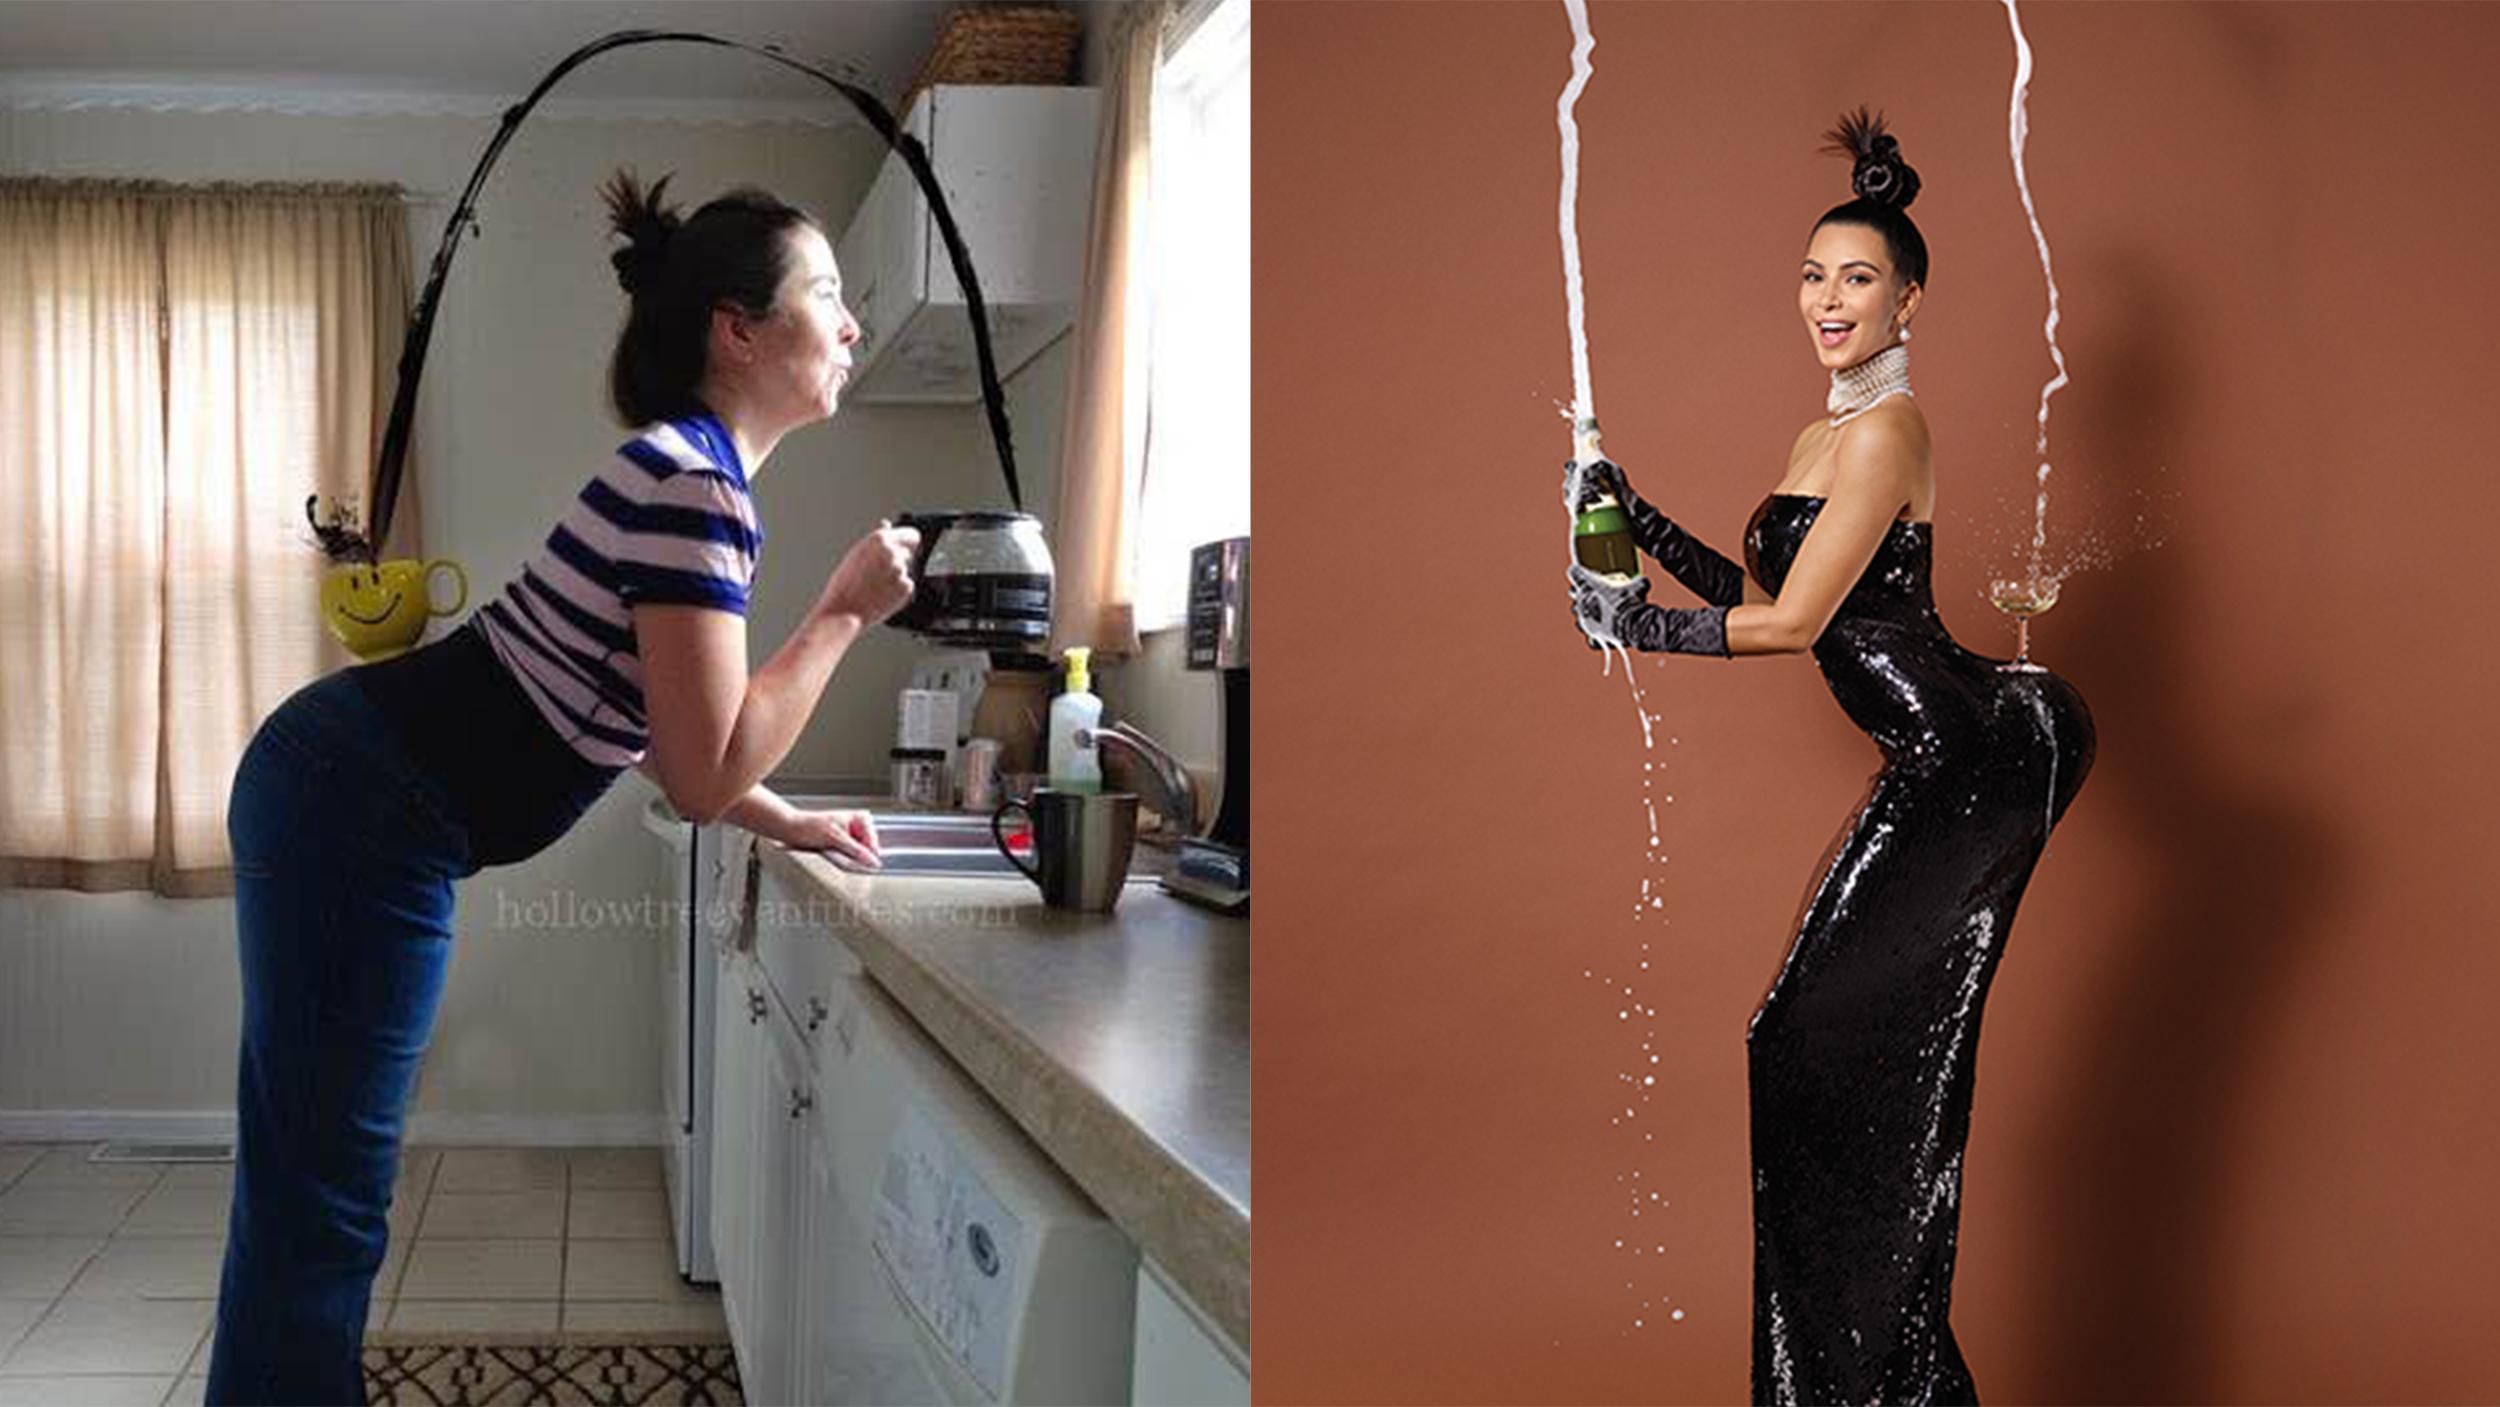 Kim kardashian cover inspires funny parodies from moms Internet magasin